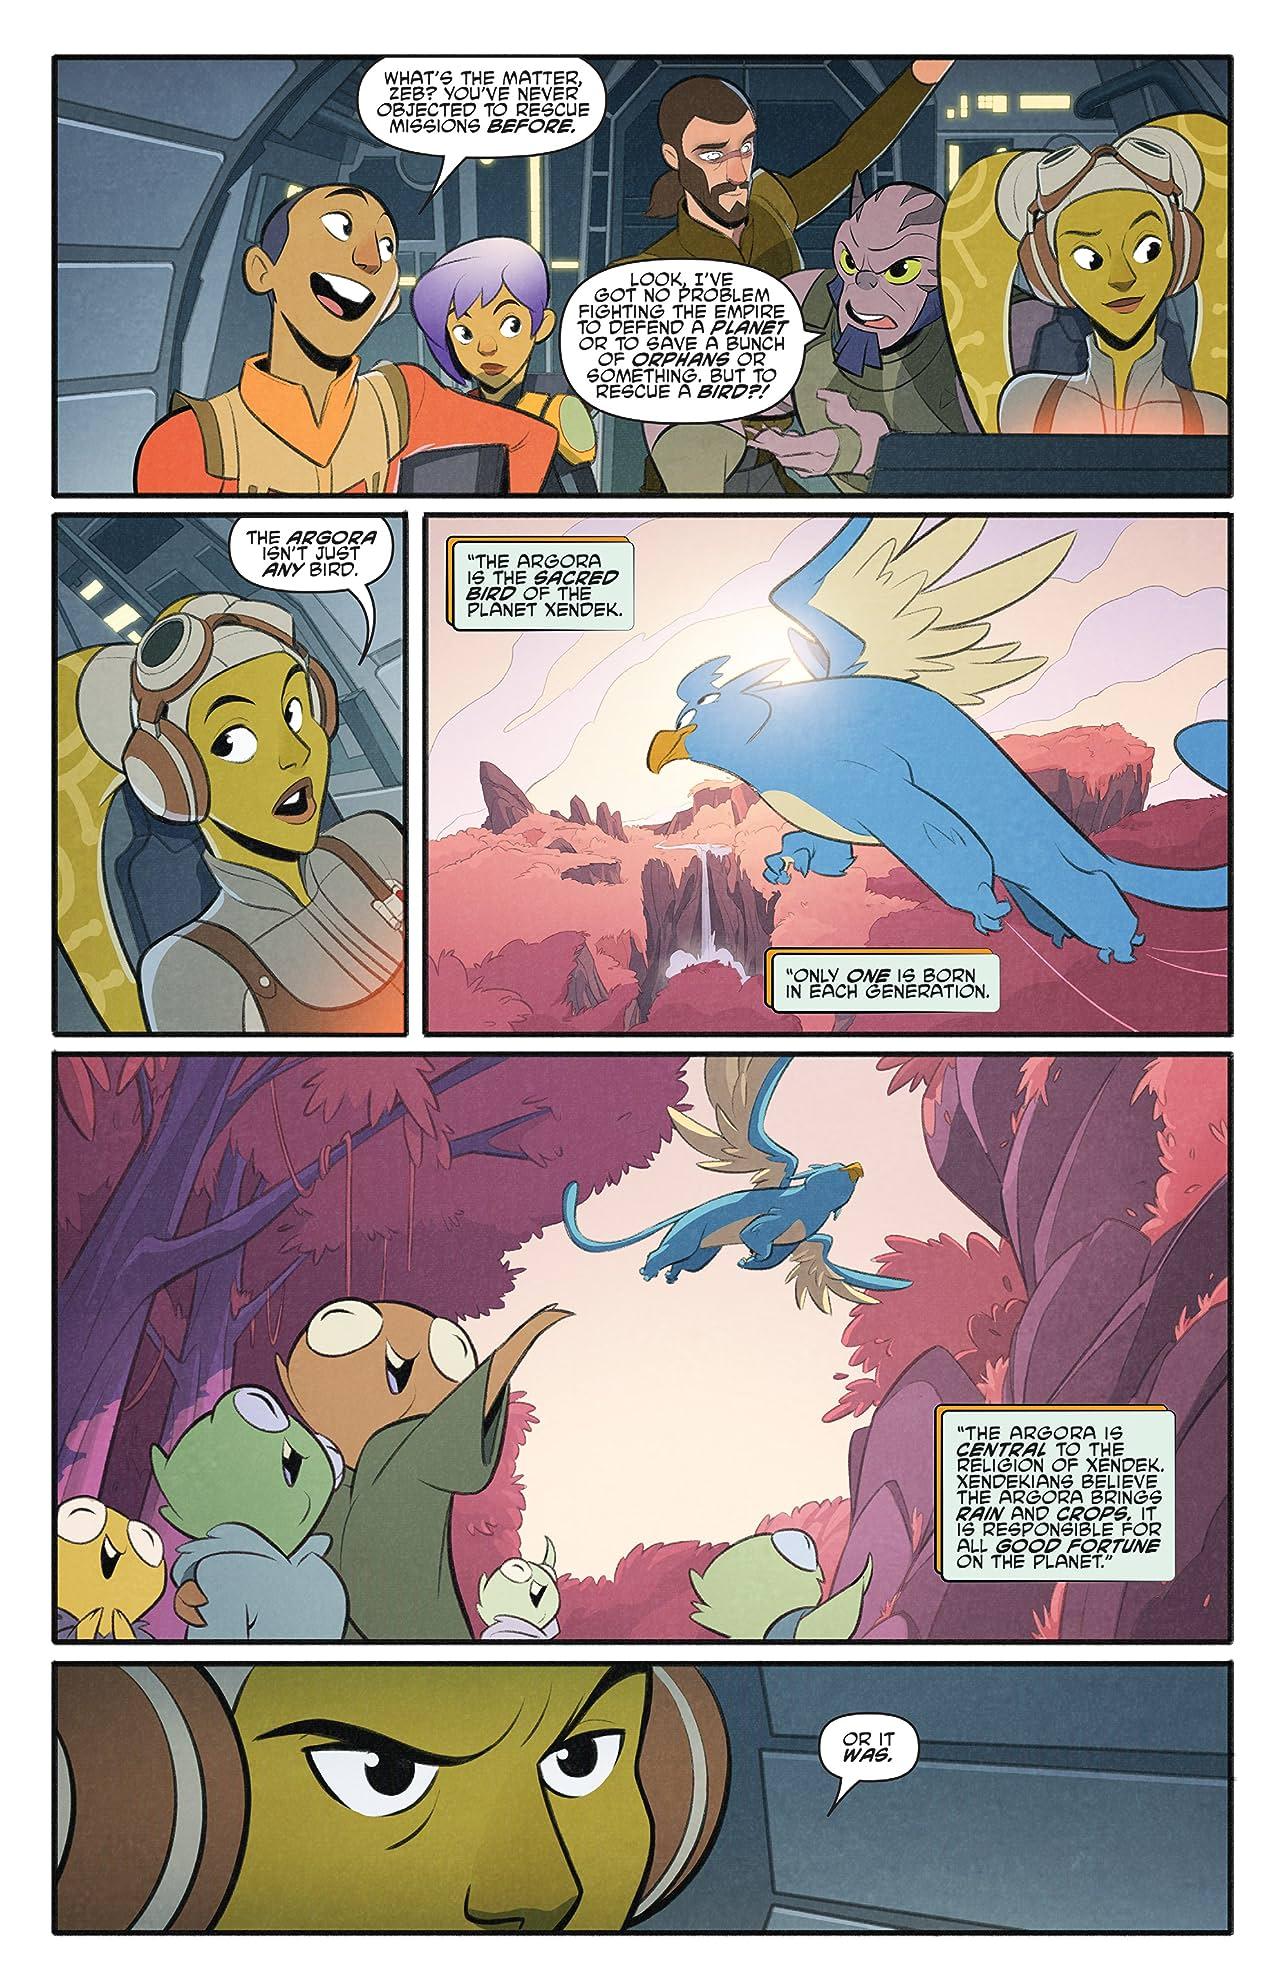 Star Wars Adventures #7